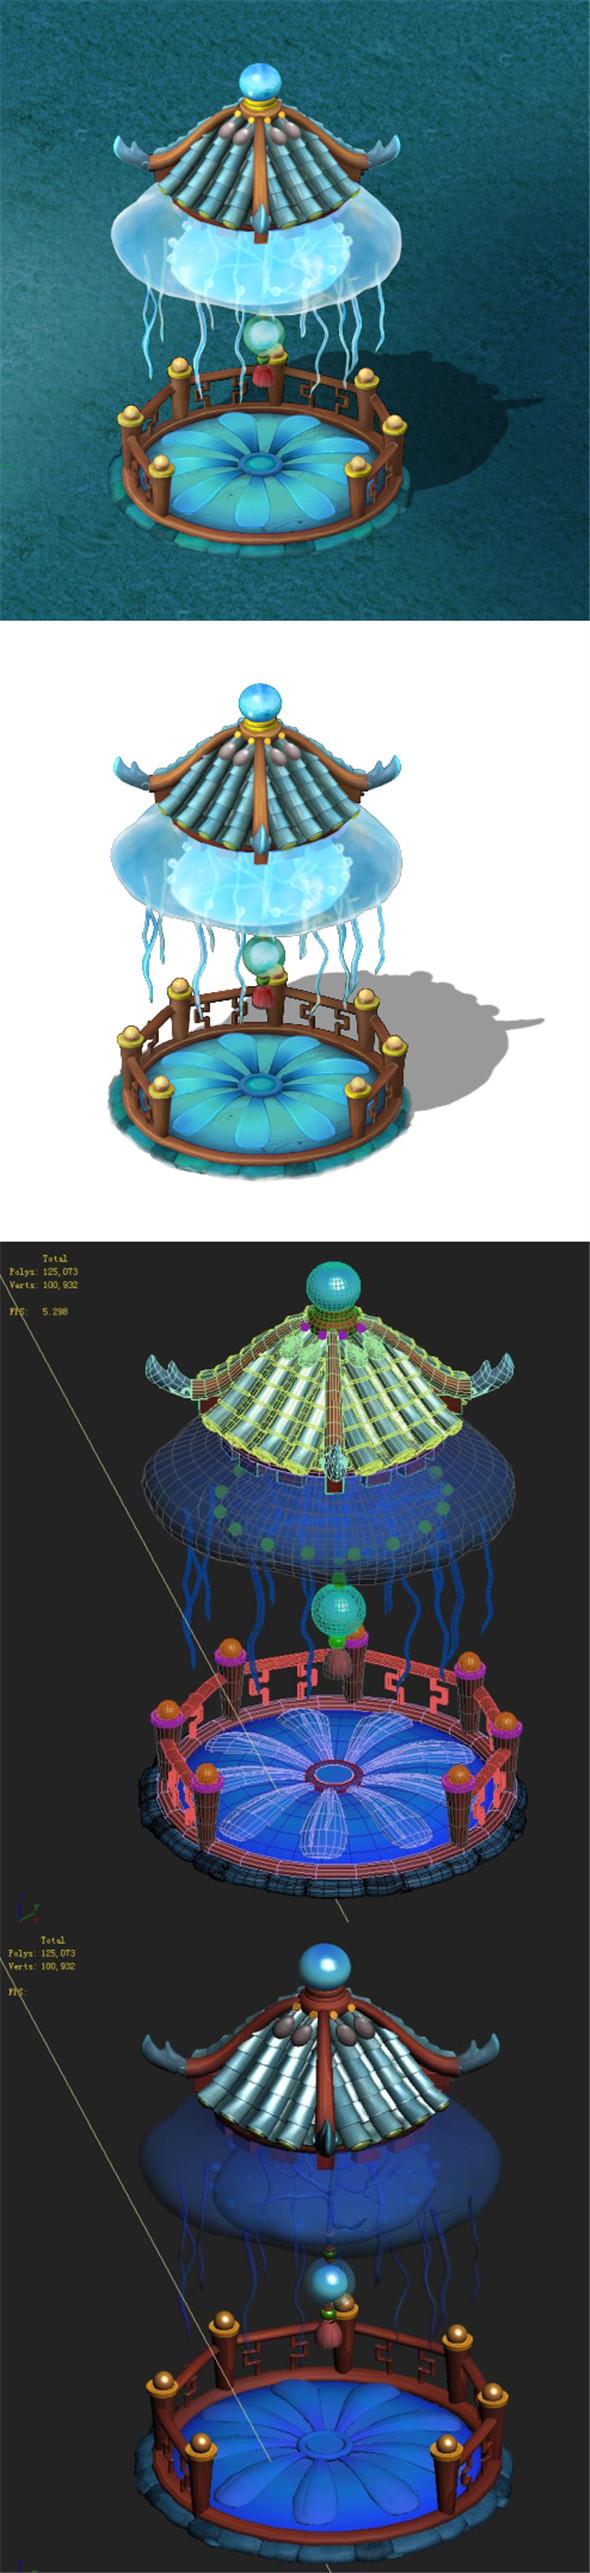 Submarine cartoon world - jellyfish pavilion - 3DOcean Item for Sale